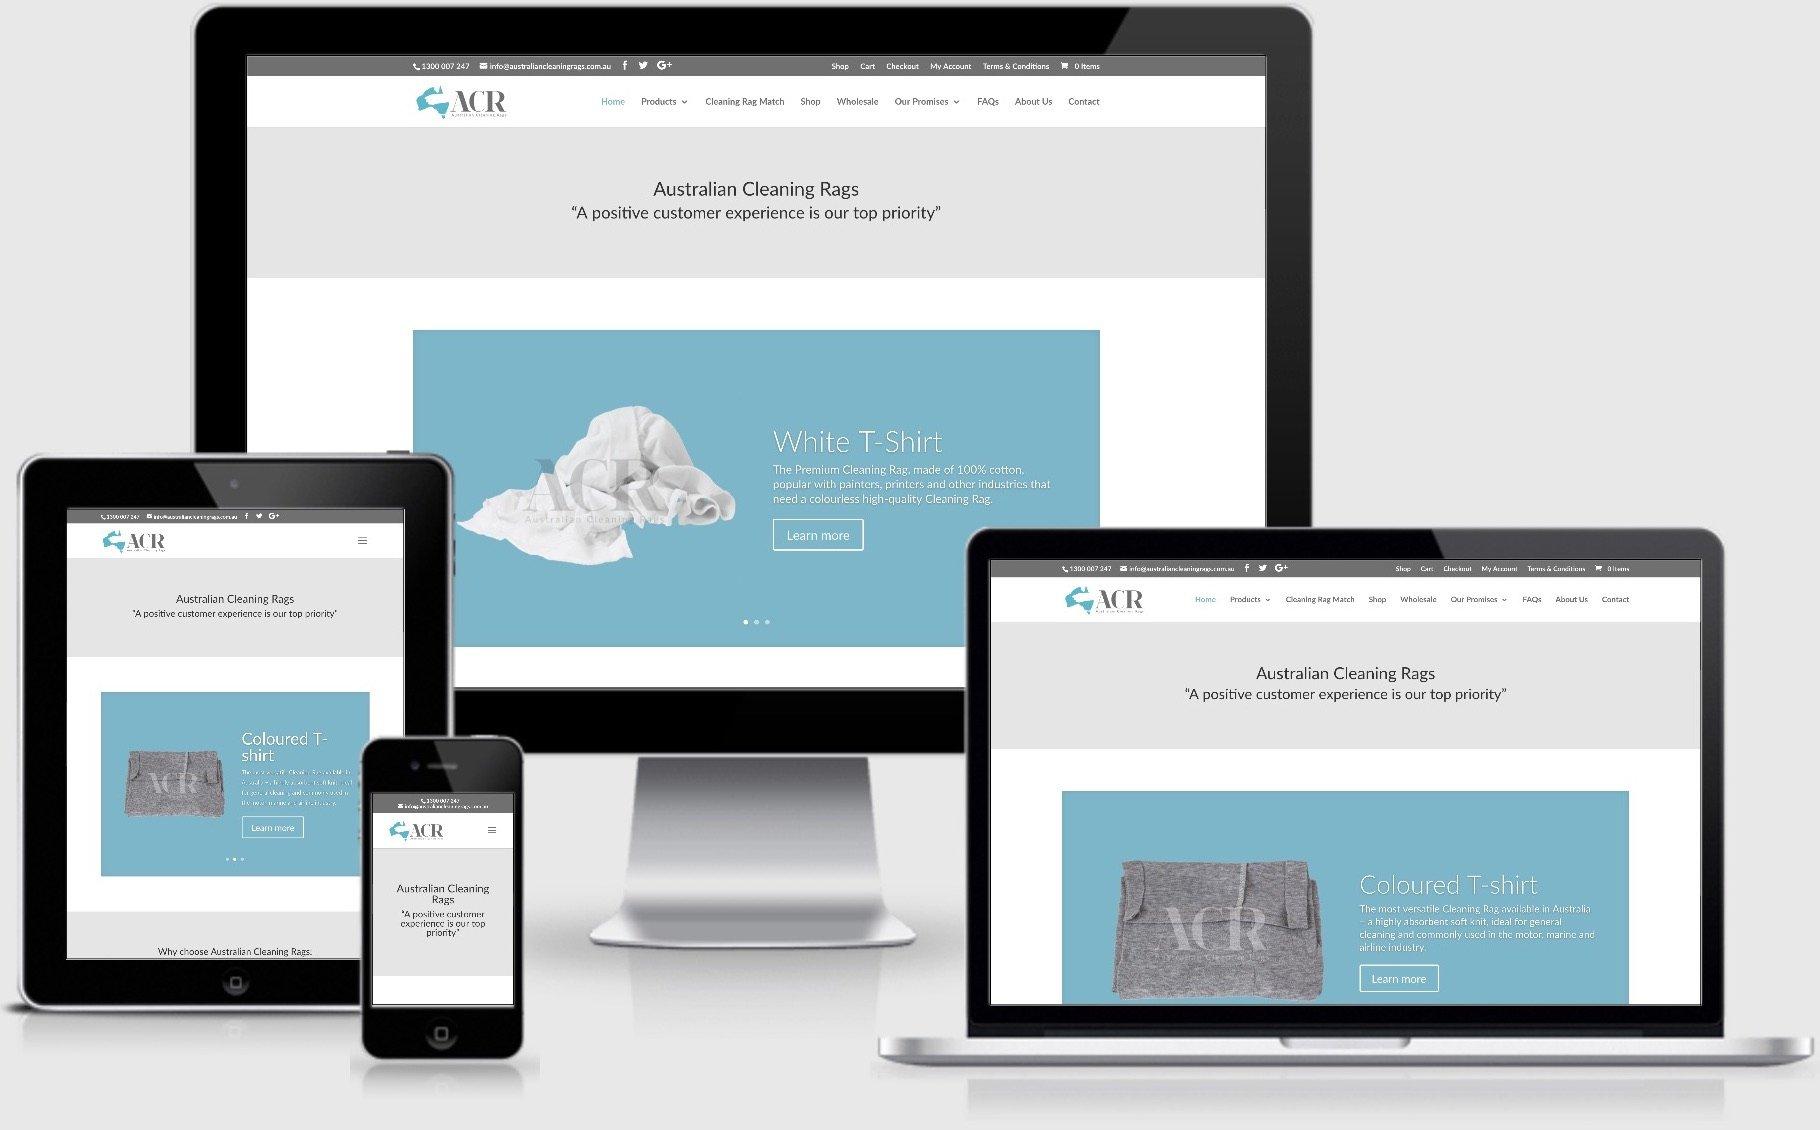 Marketing-Squad-ACR-Websites